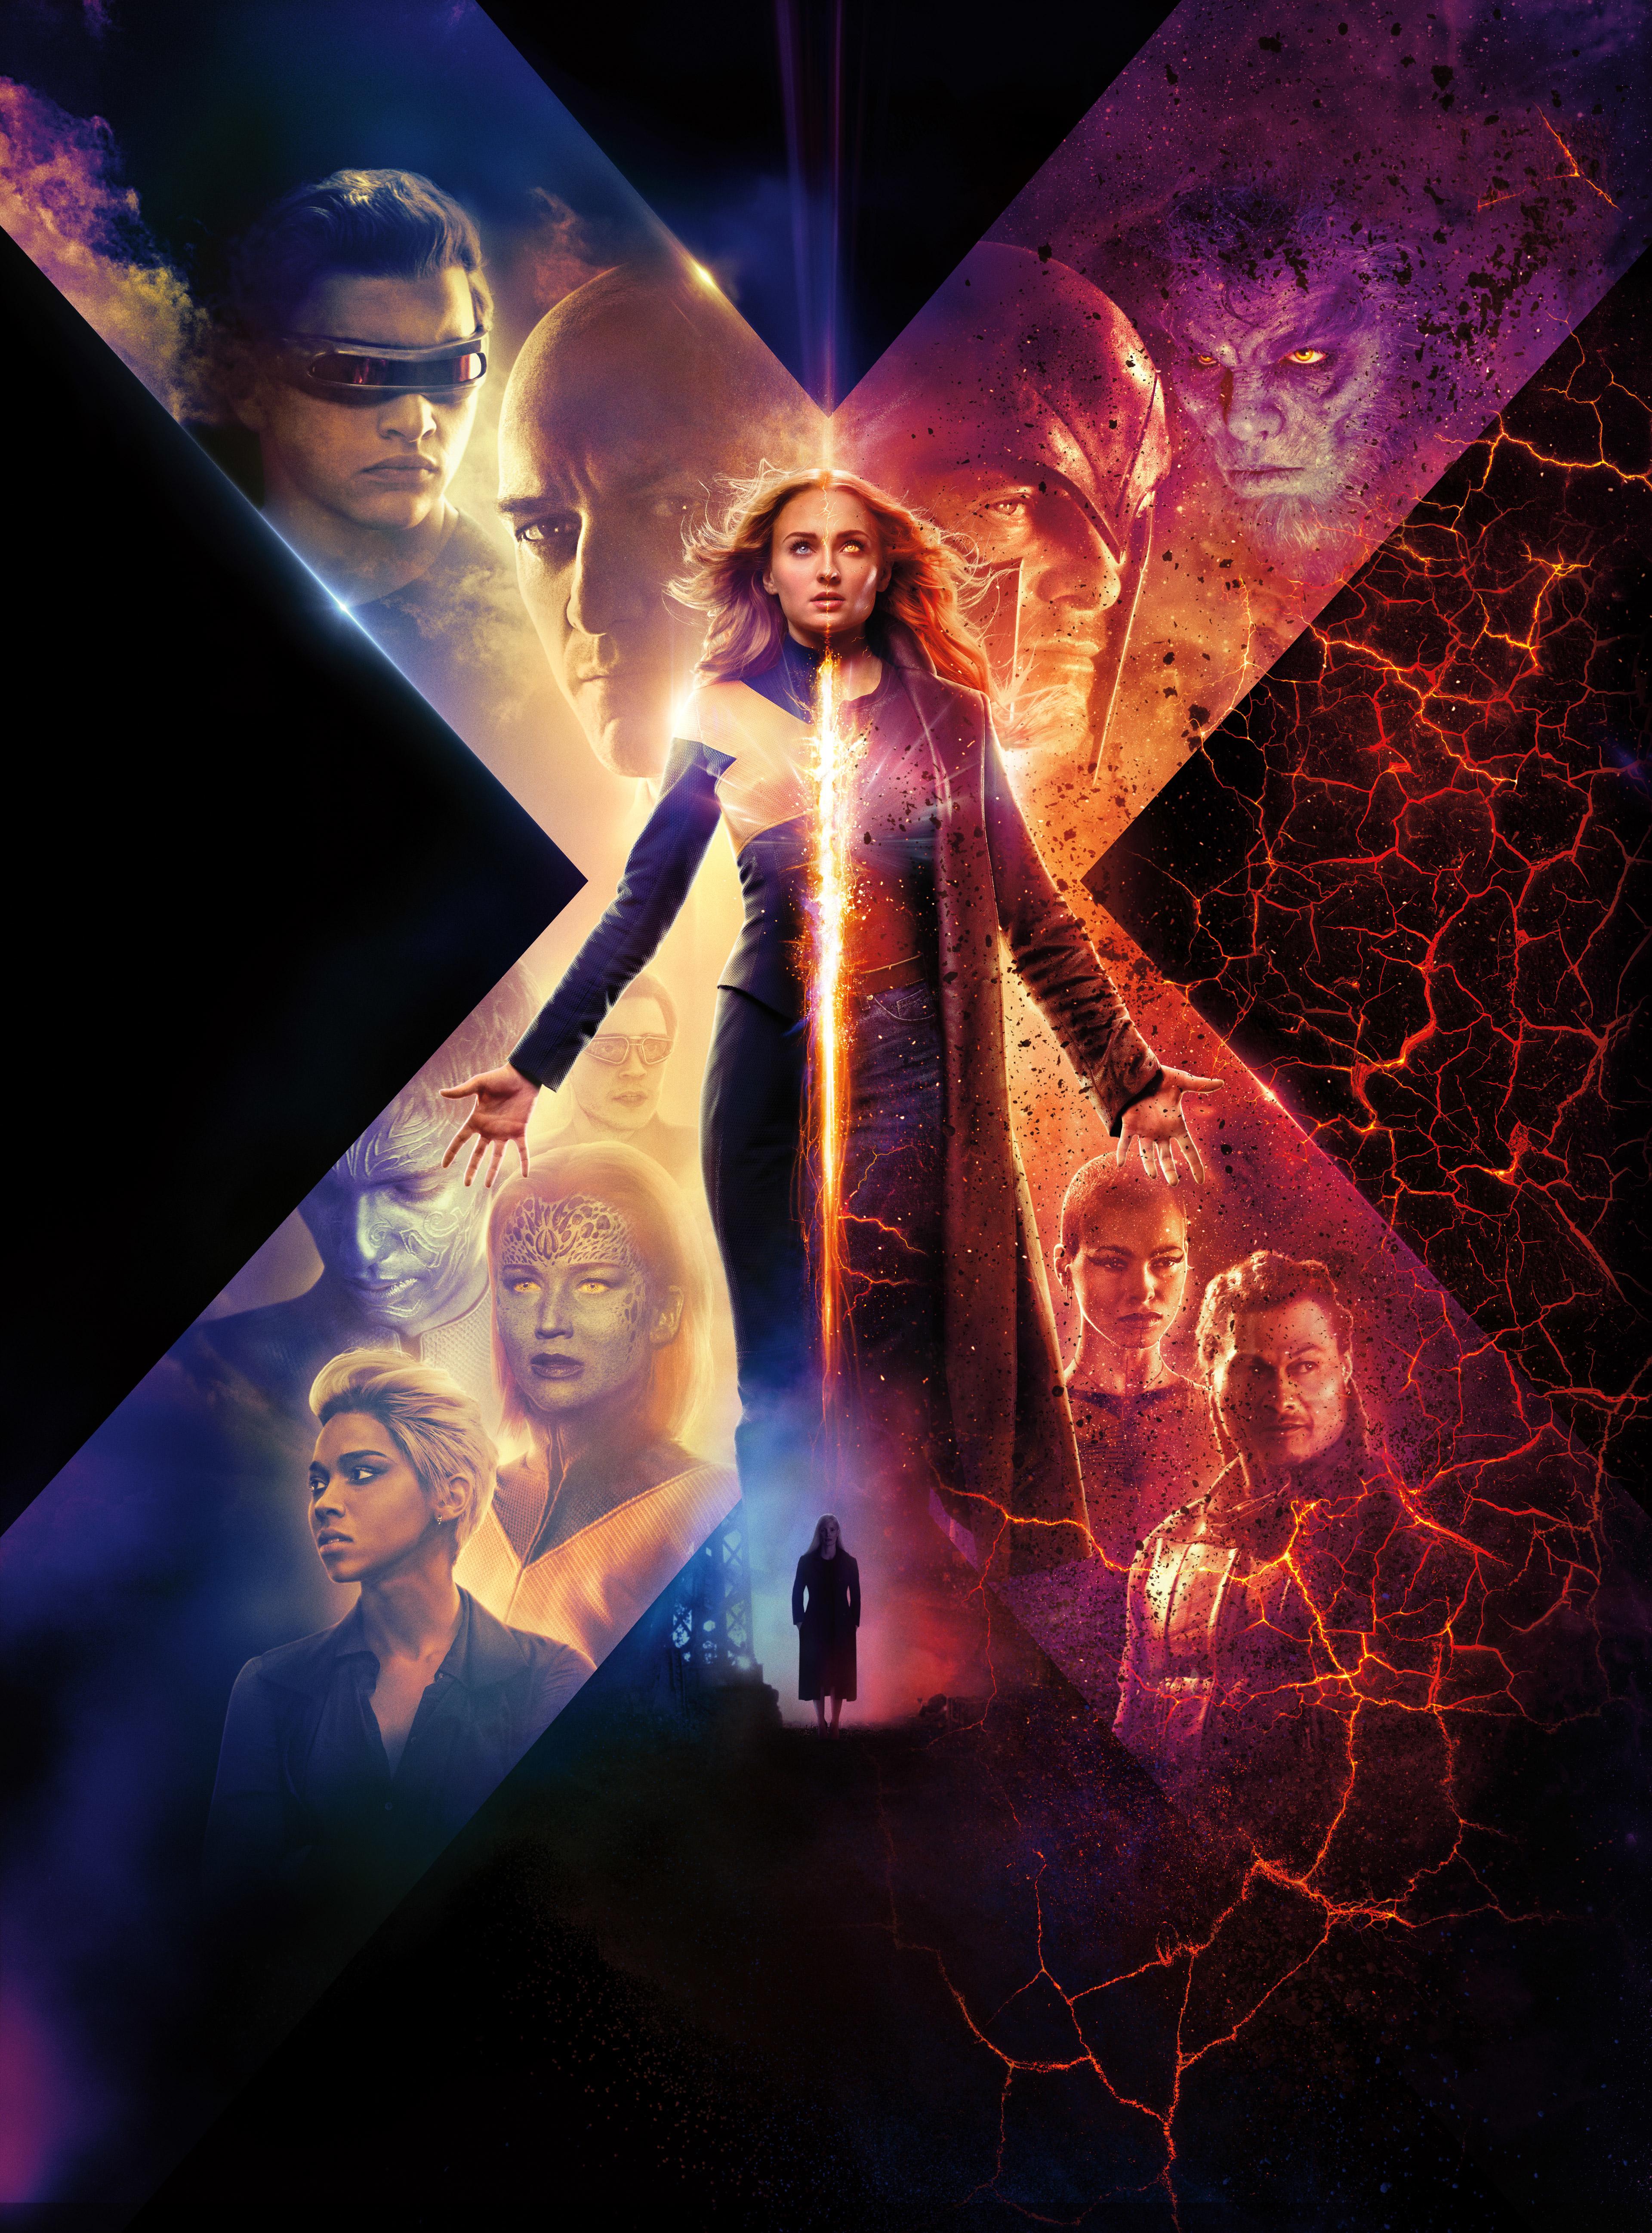 Free Download X Men Dark Phoenix 2019 Movie New Poster Wallpaper Hd Movies 4k 3840x5189 For Your Desktop Mobile Tablet Explore 57 X Men Movies Wallpapers X Men Movies